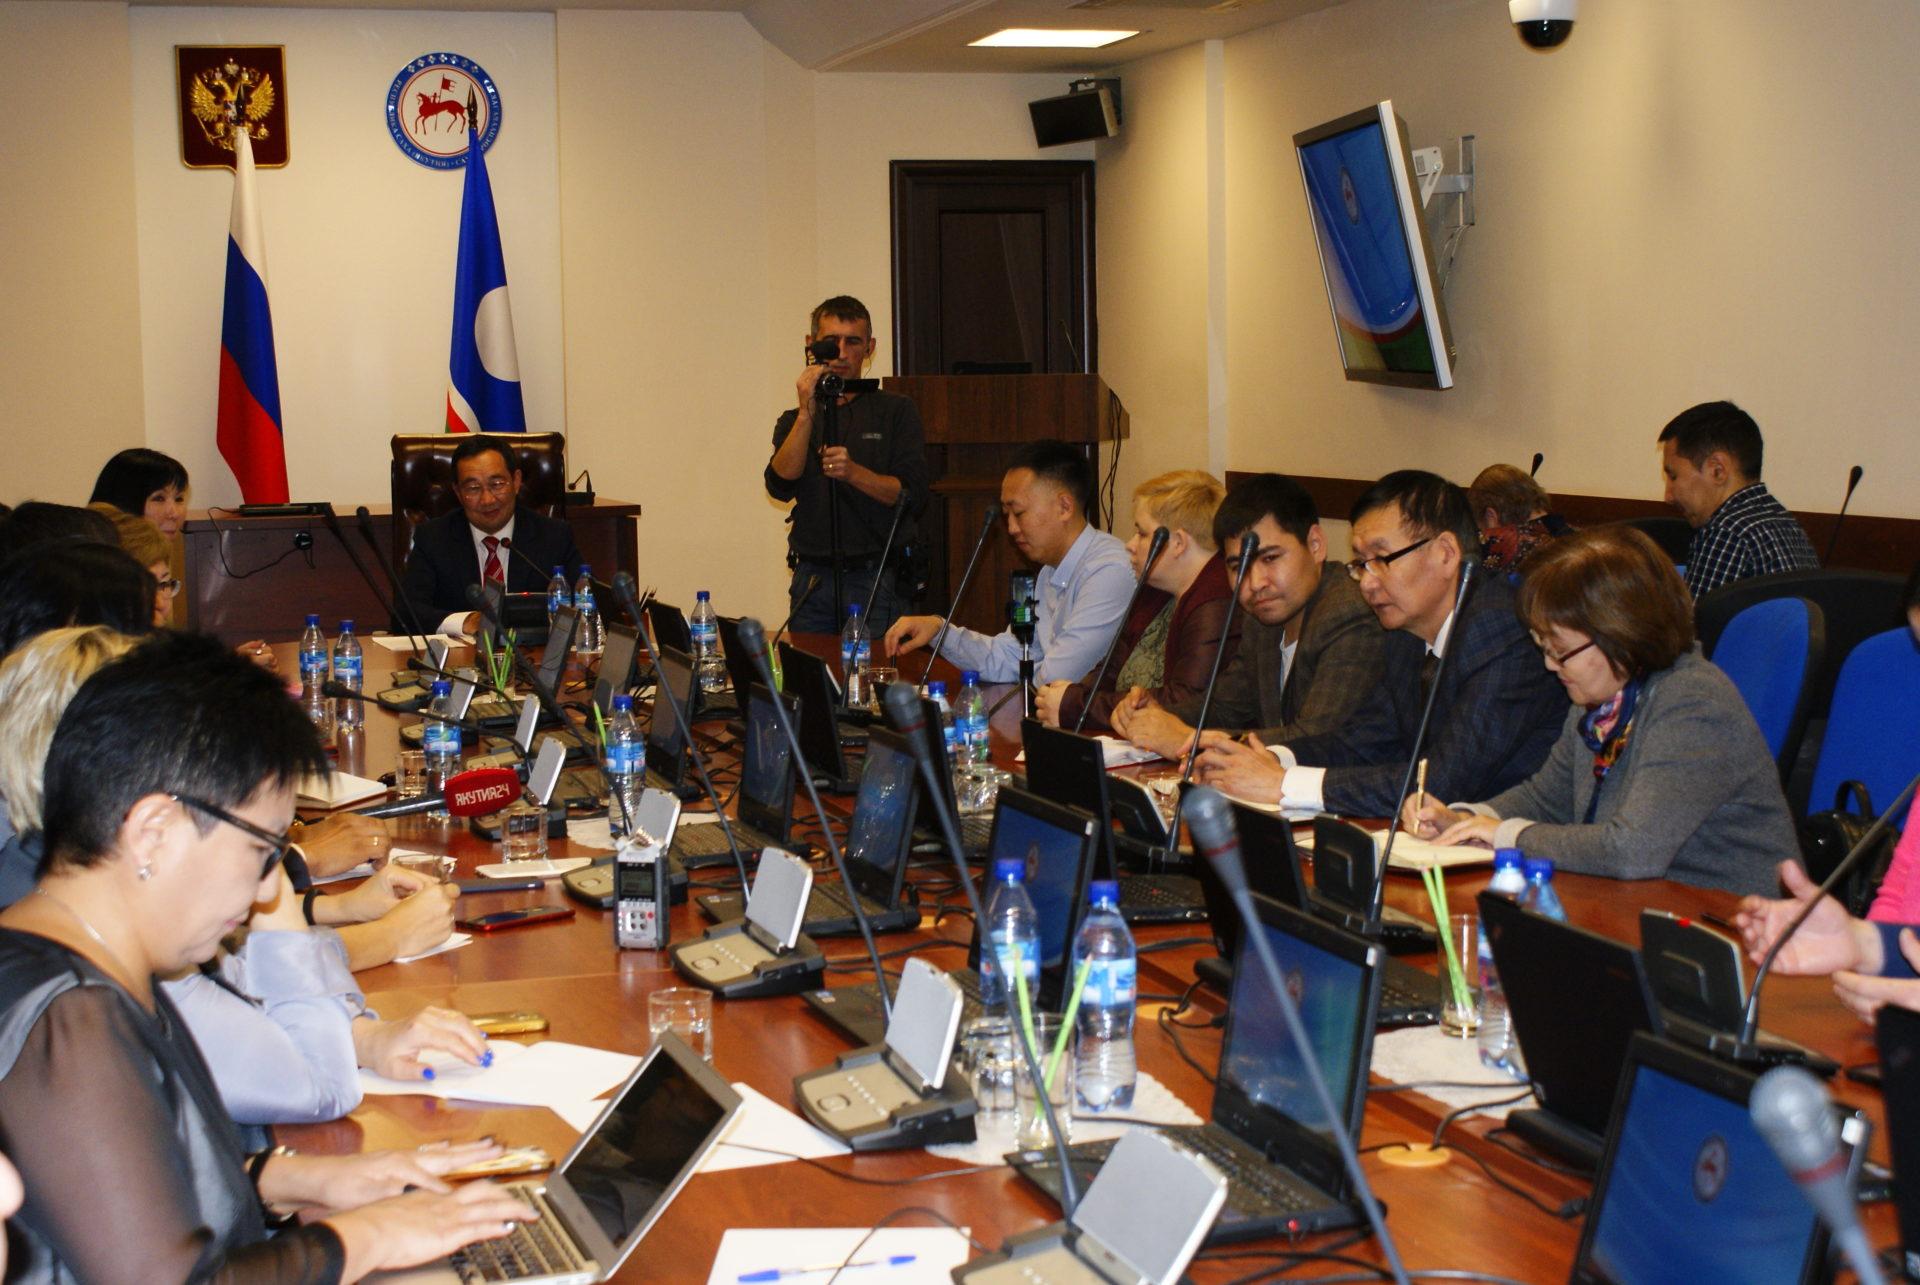 Айсен Николаев ждет предложений от населения